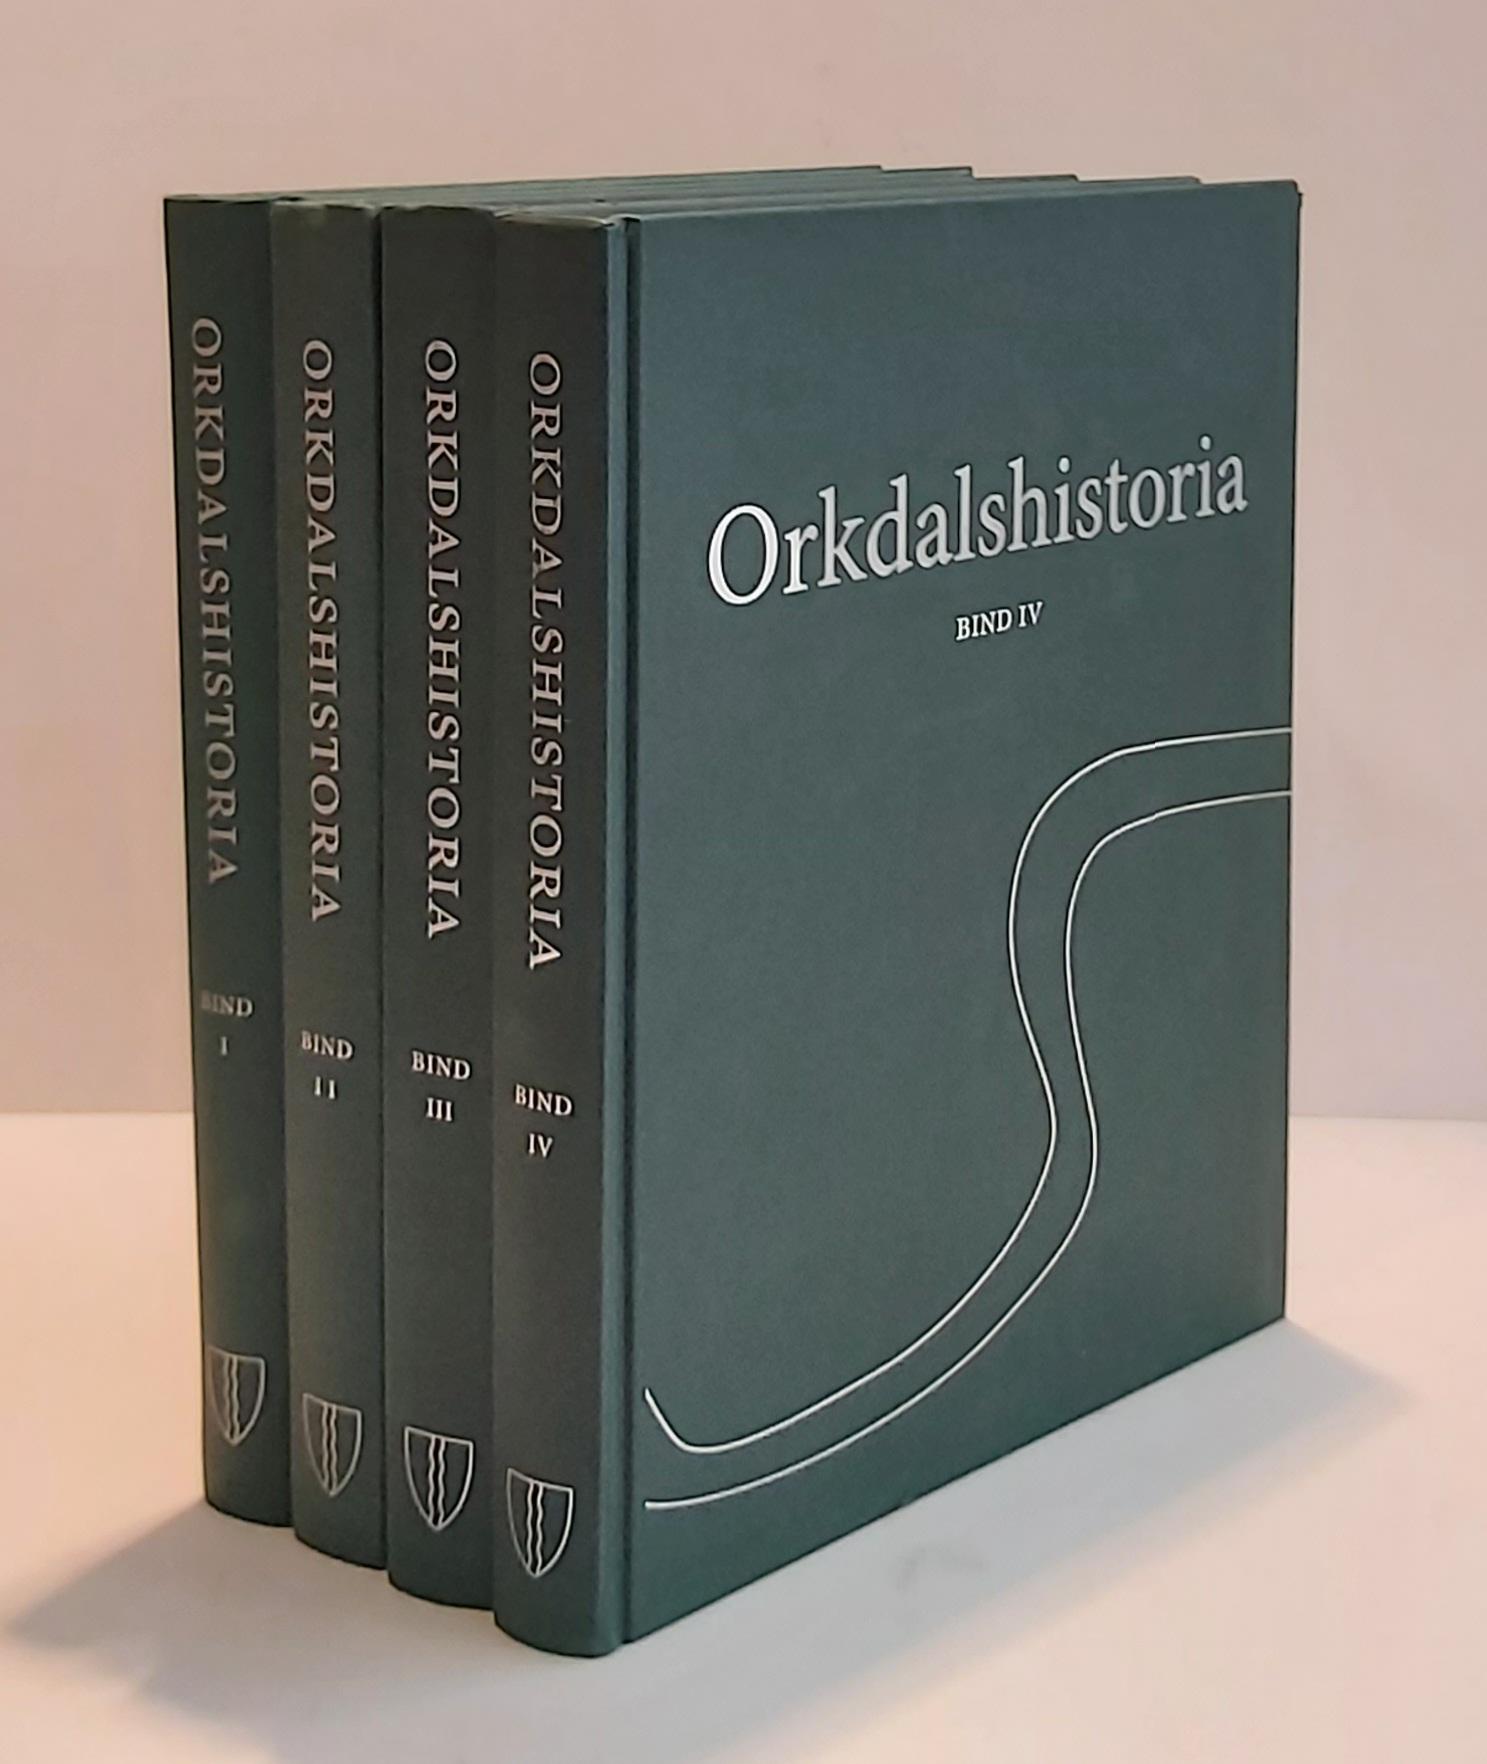 Orkdalshistoria. Fra istid til 1600. / Fra 1600 til 1837. / Fra 1838 til 1920. / Fra 1920 til 2013.